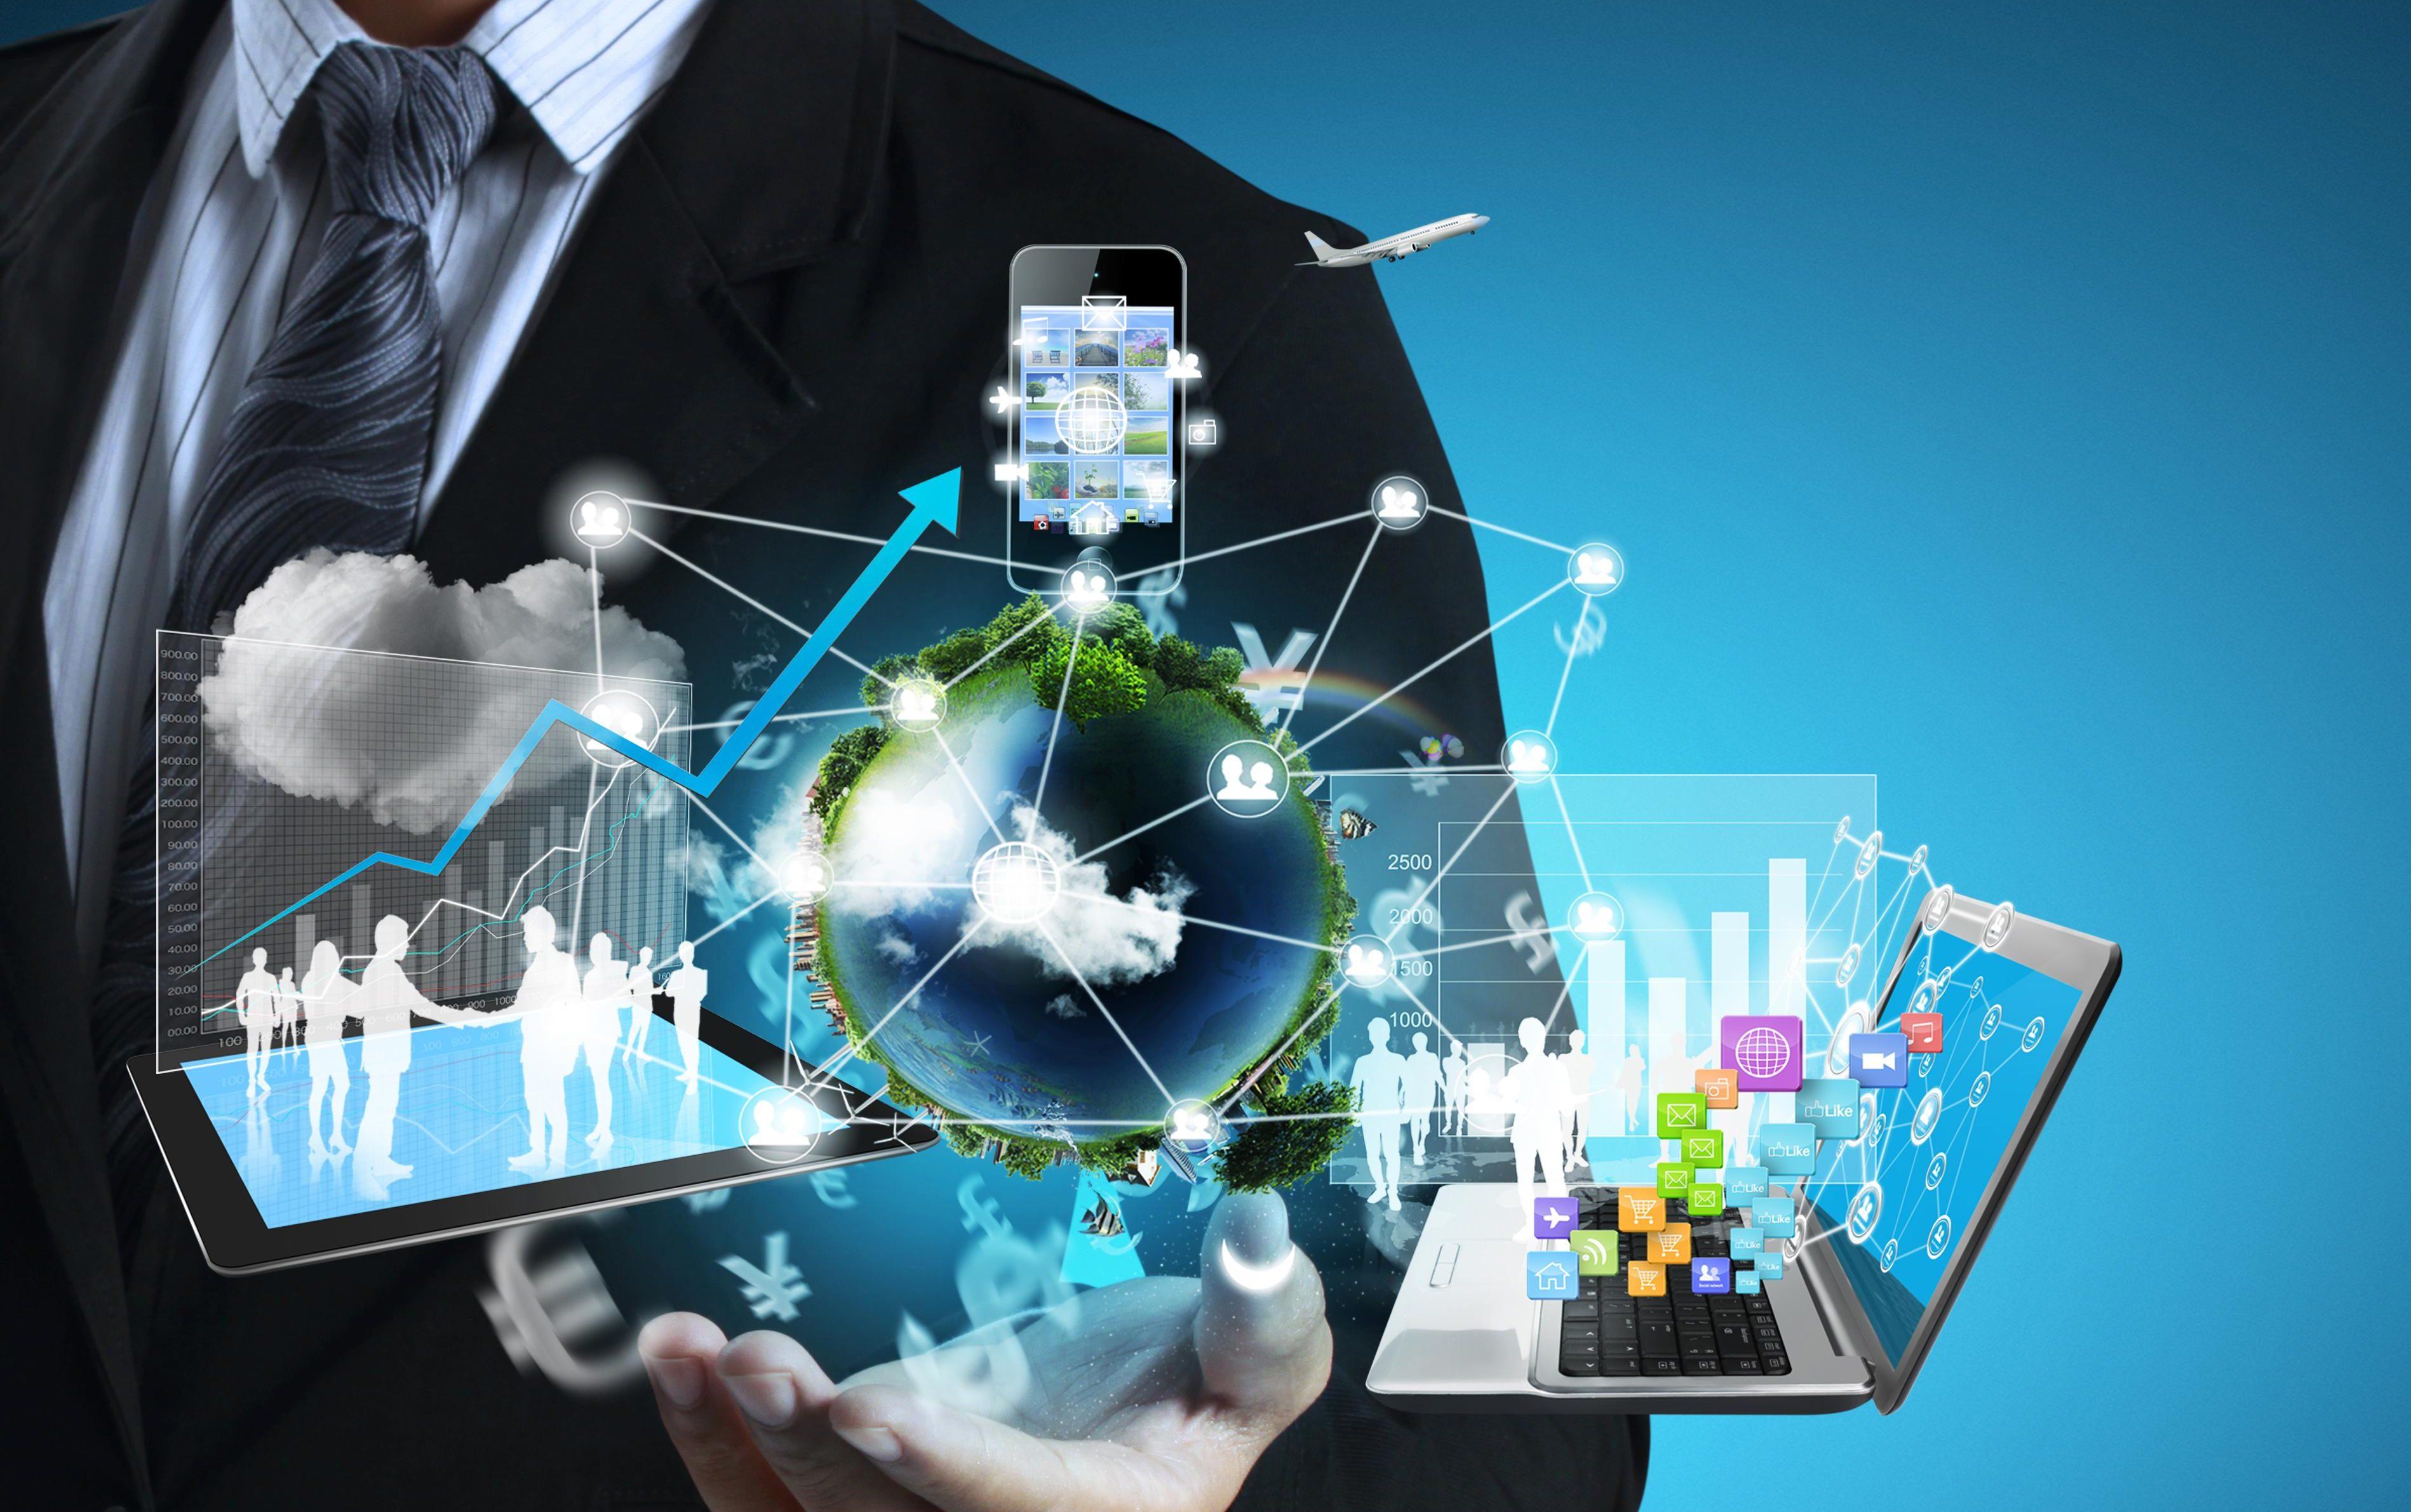 На каком этапе находится ваш онлайн-бизнес?